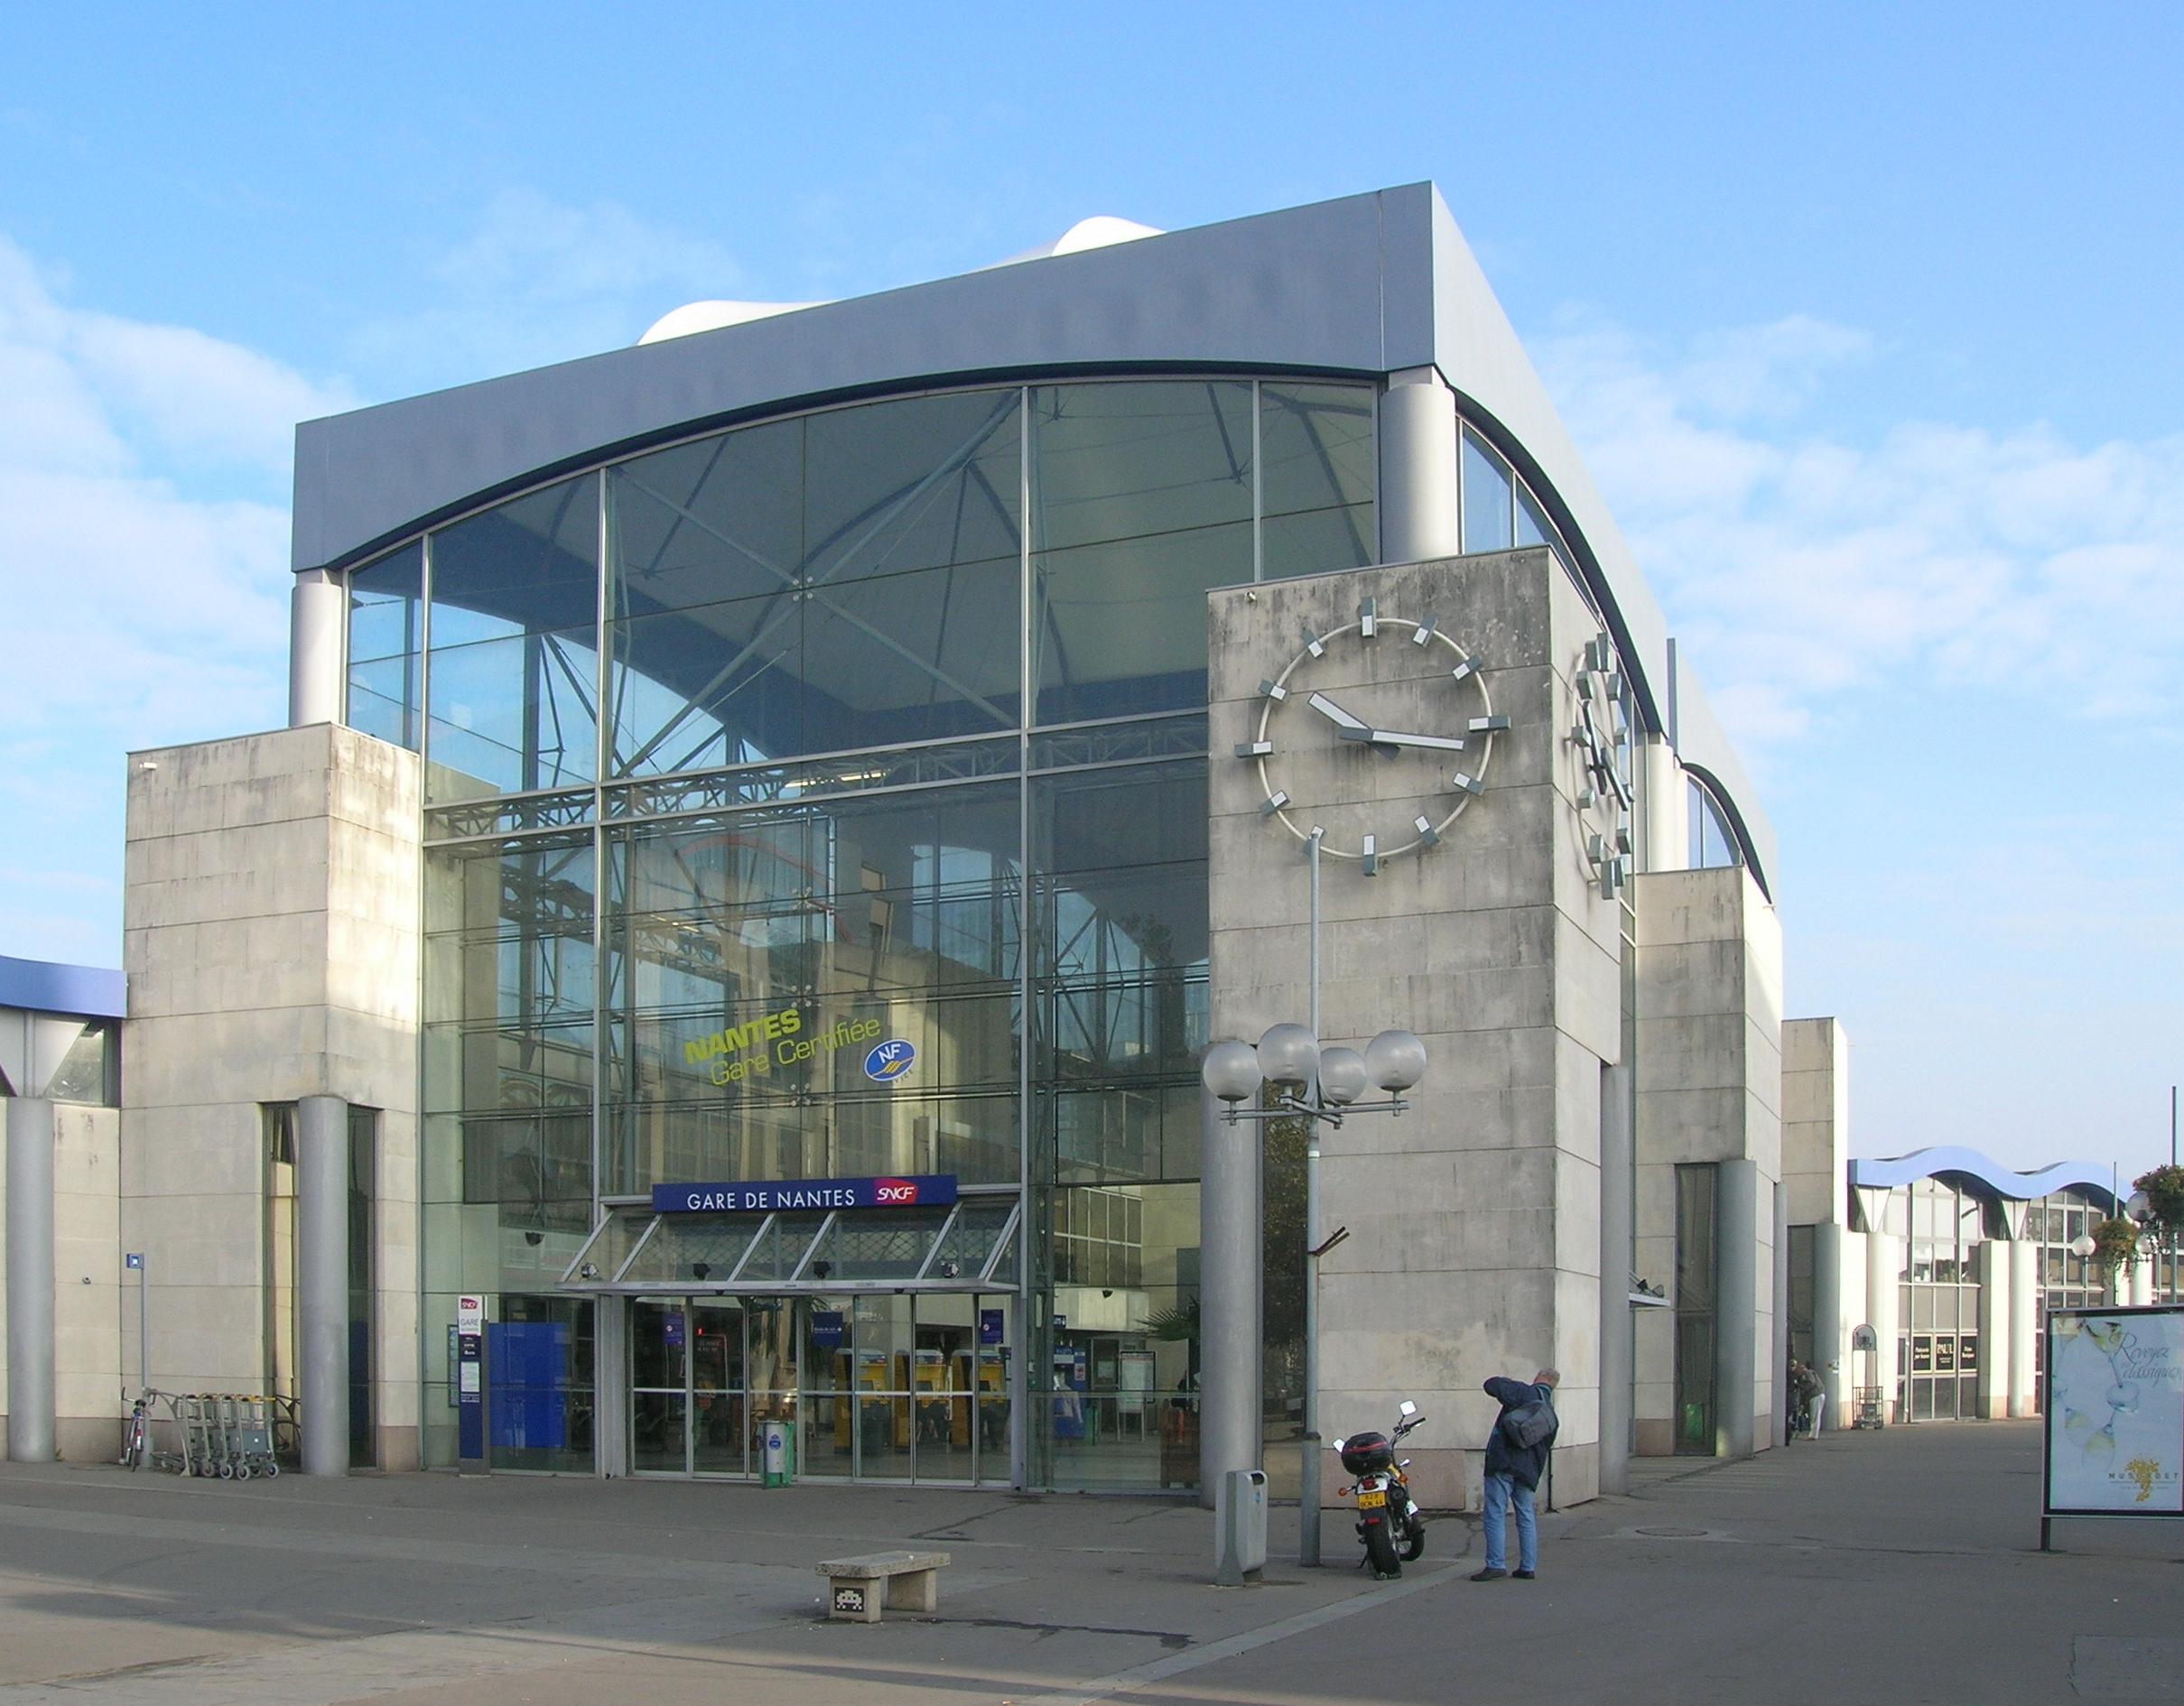 http://fr.academic.ru/pictures/frwiki/71/Gare_de_Nantes_sud.JPG